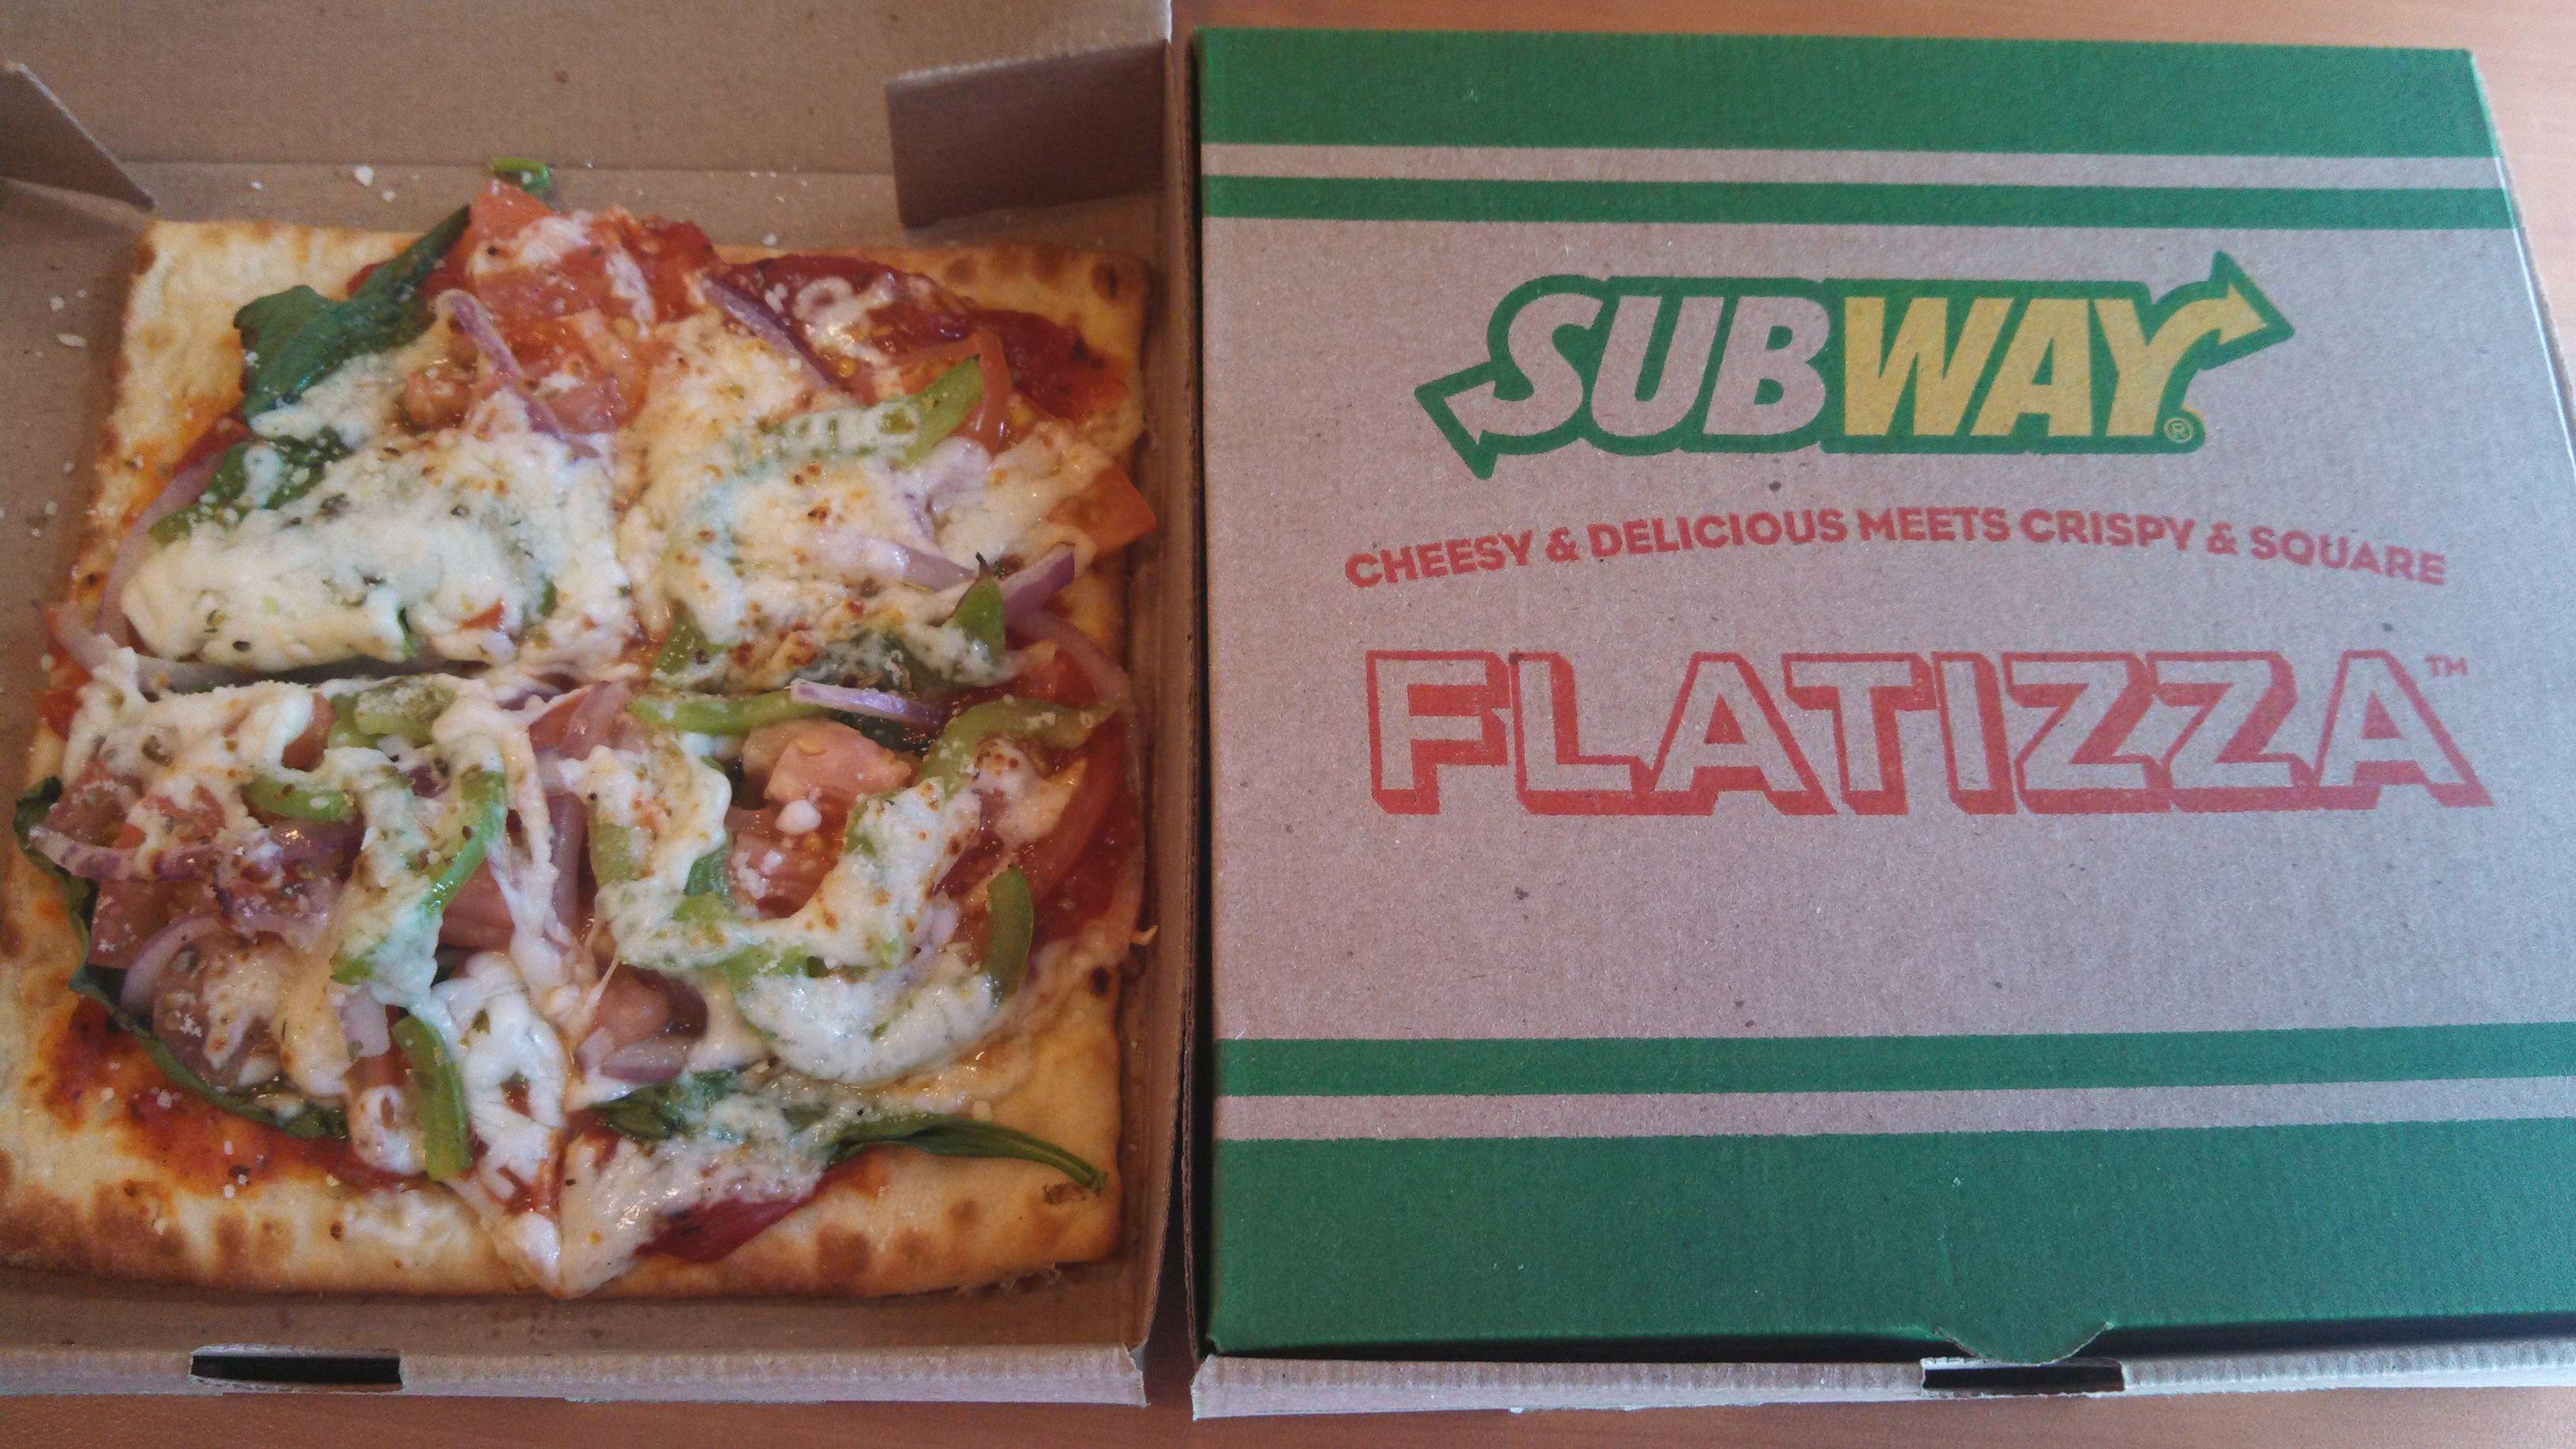 subway veggie flatizza frank s food fascination pinterest food